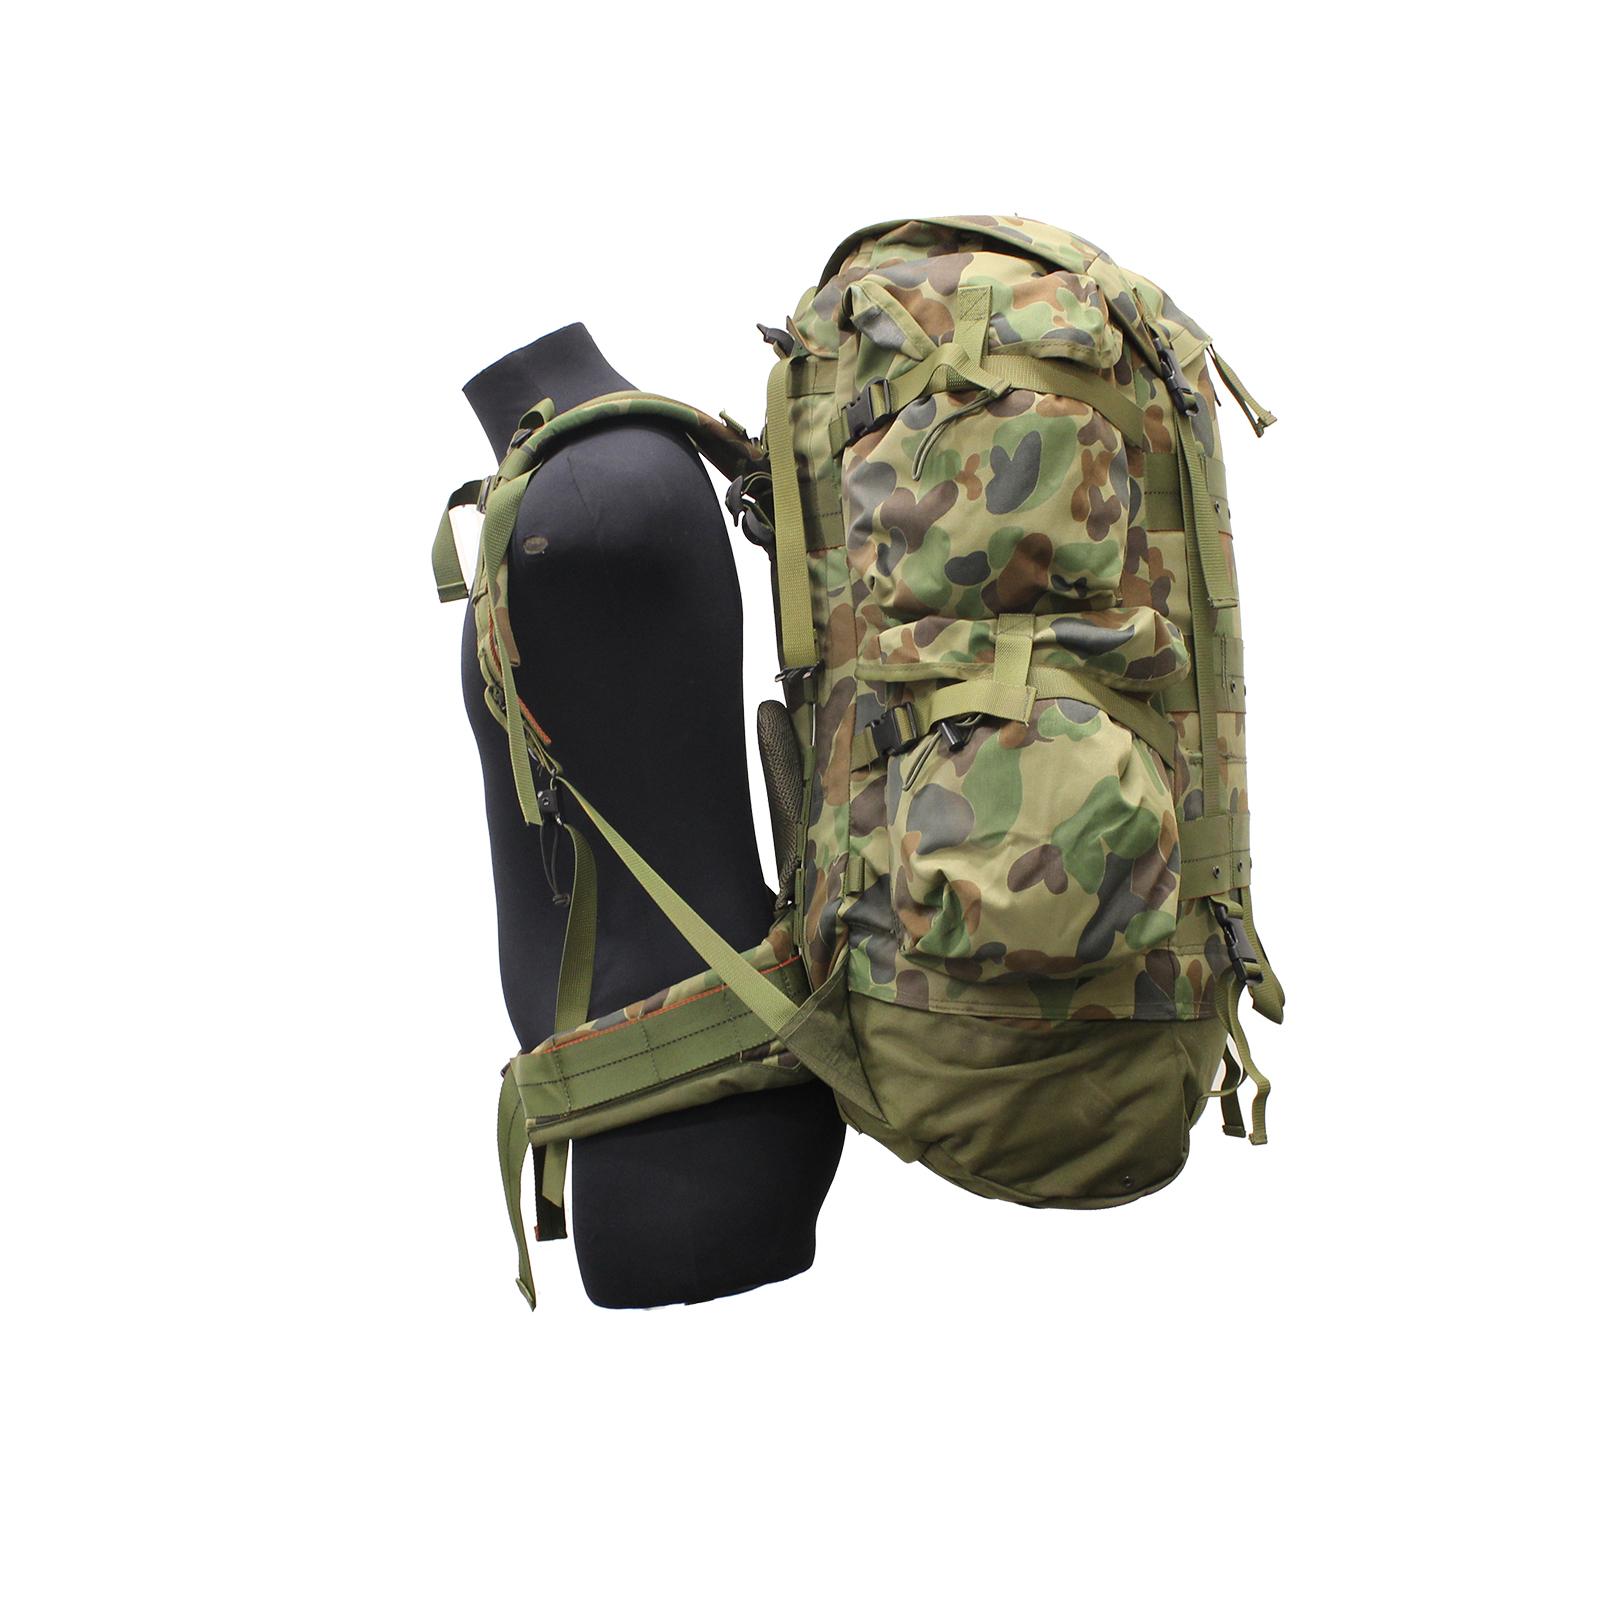 34744b6f2cf1 GI CFP-90 COMBAT PACK AUSCAM - COMMANDO   MILITARY-Bags   Packs ...